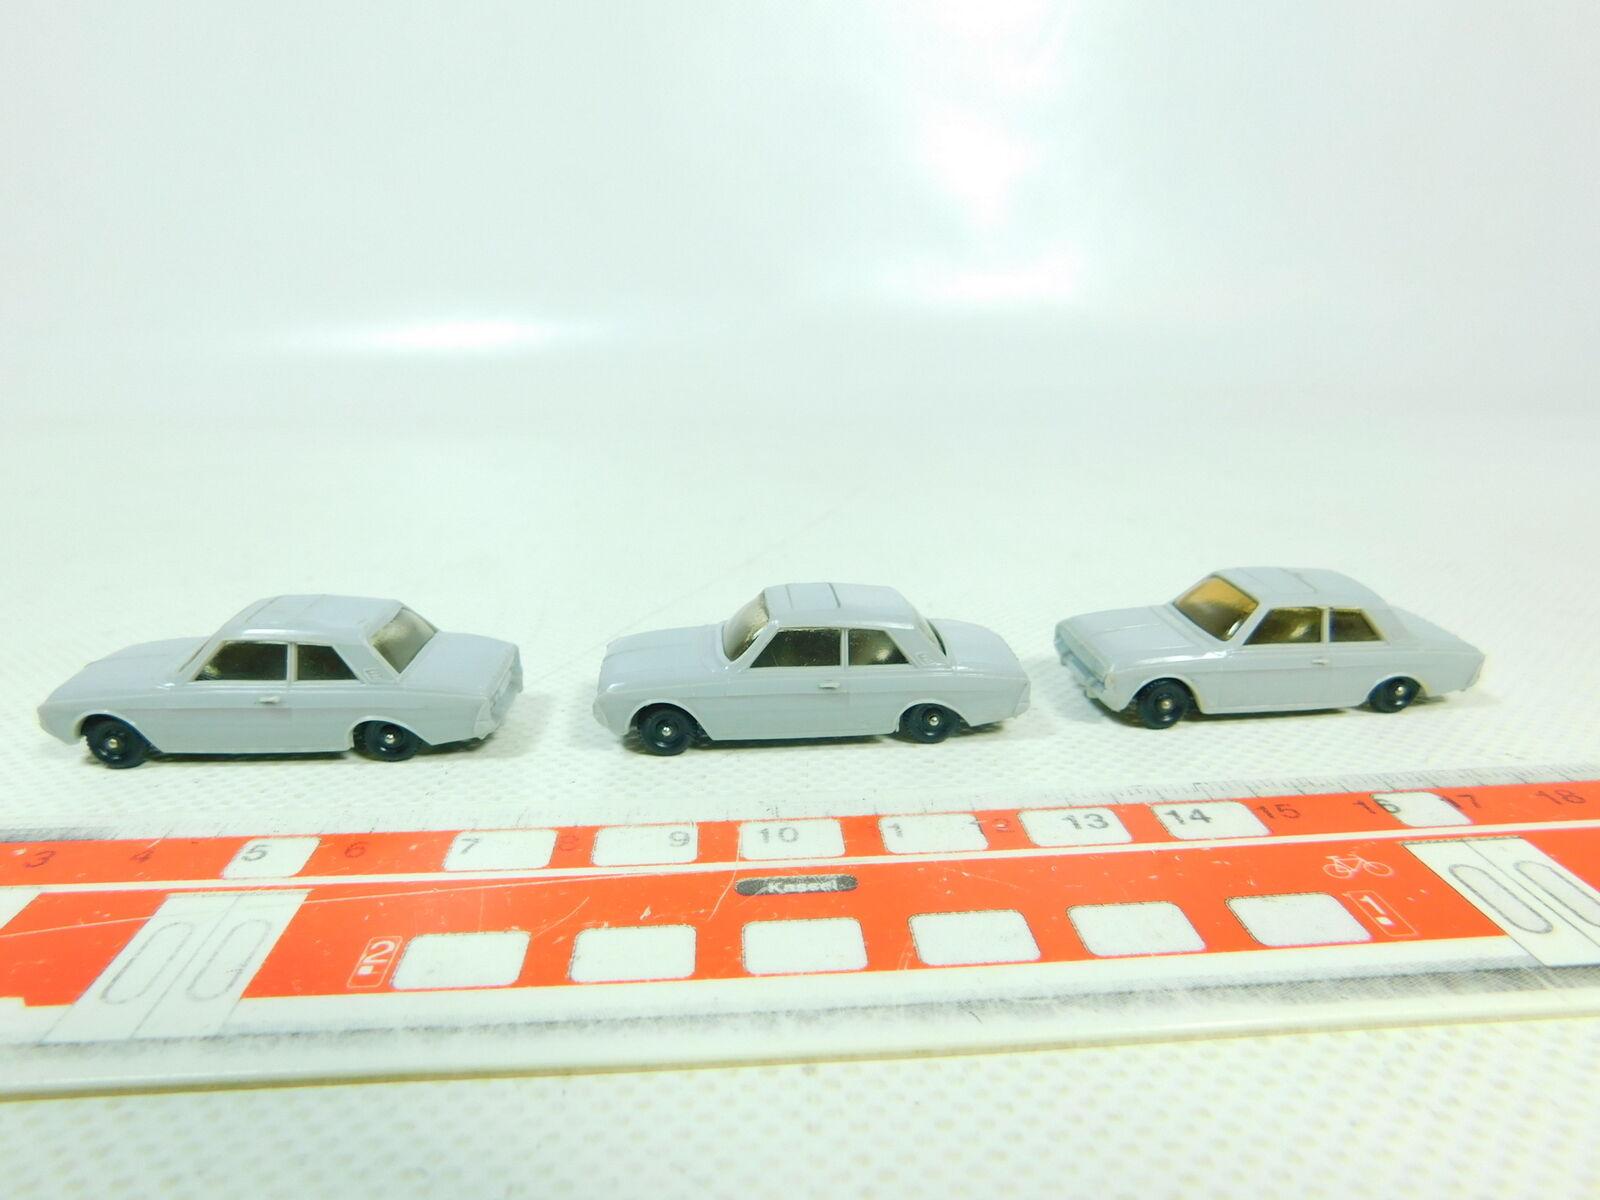 Bt605-0, 5  3x MÄRKLIN h0 voiture ford taunus 17 M pour 4613 autotransport voiture